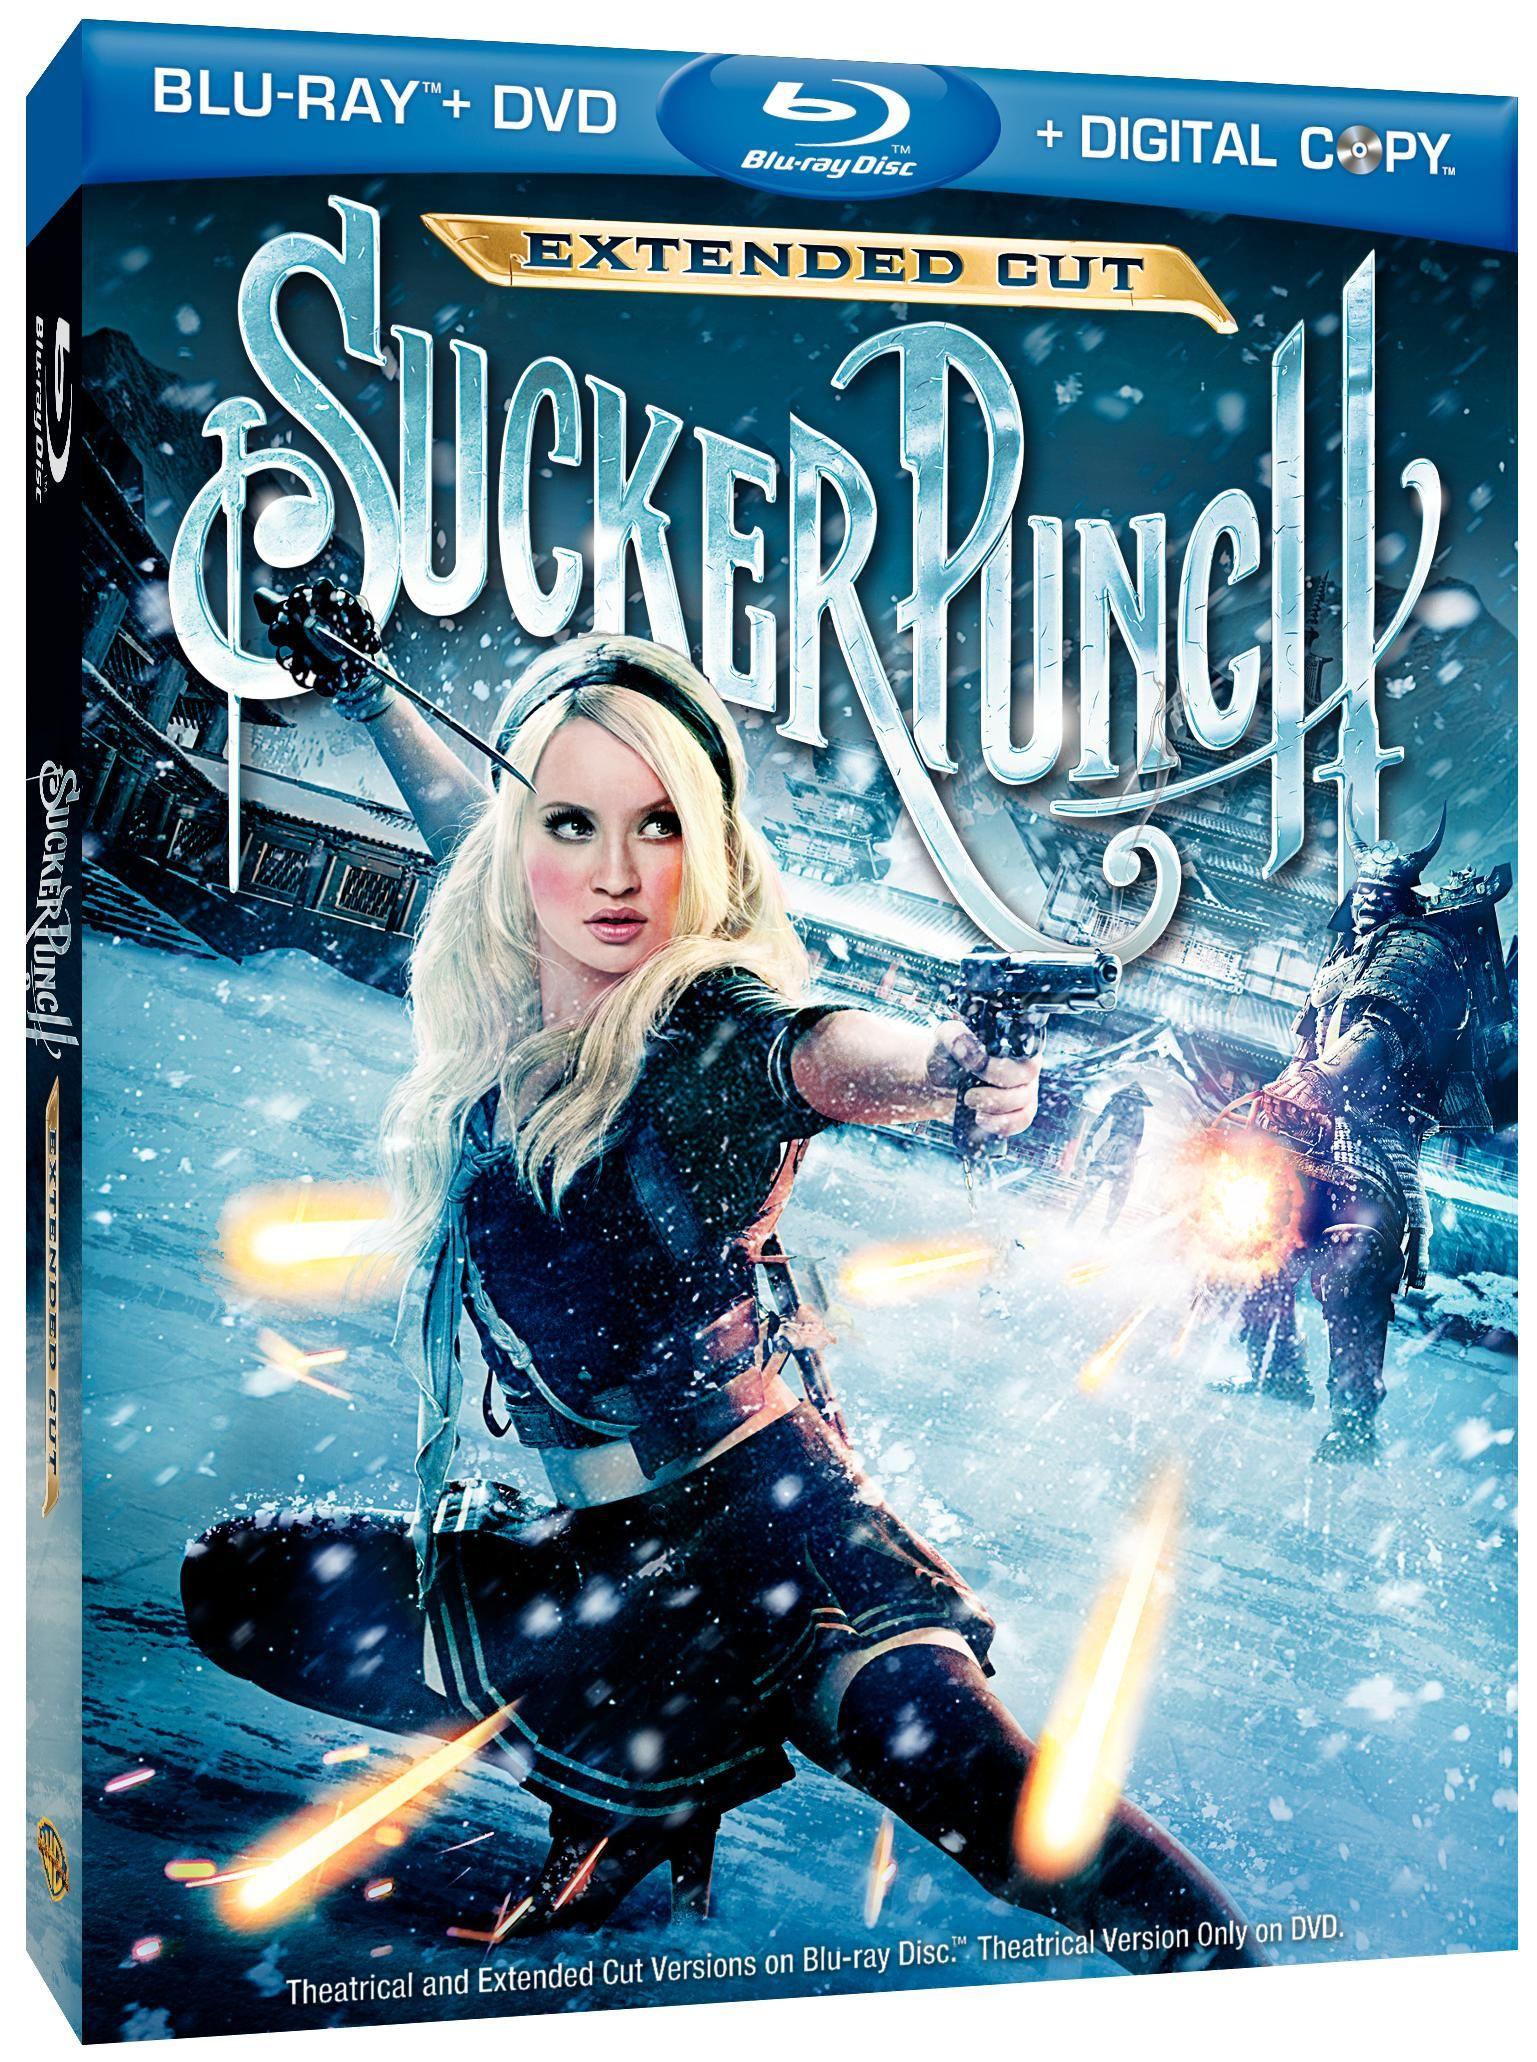 Pin De Samuel Mello Em Sucker Punch Filmes Sucker Punch Lista